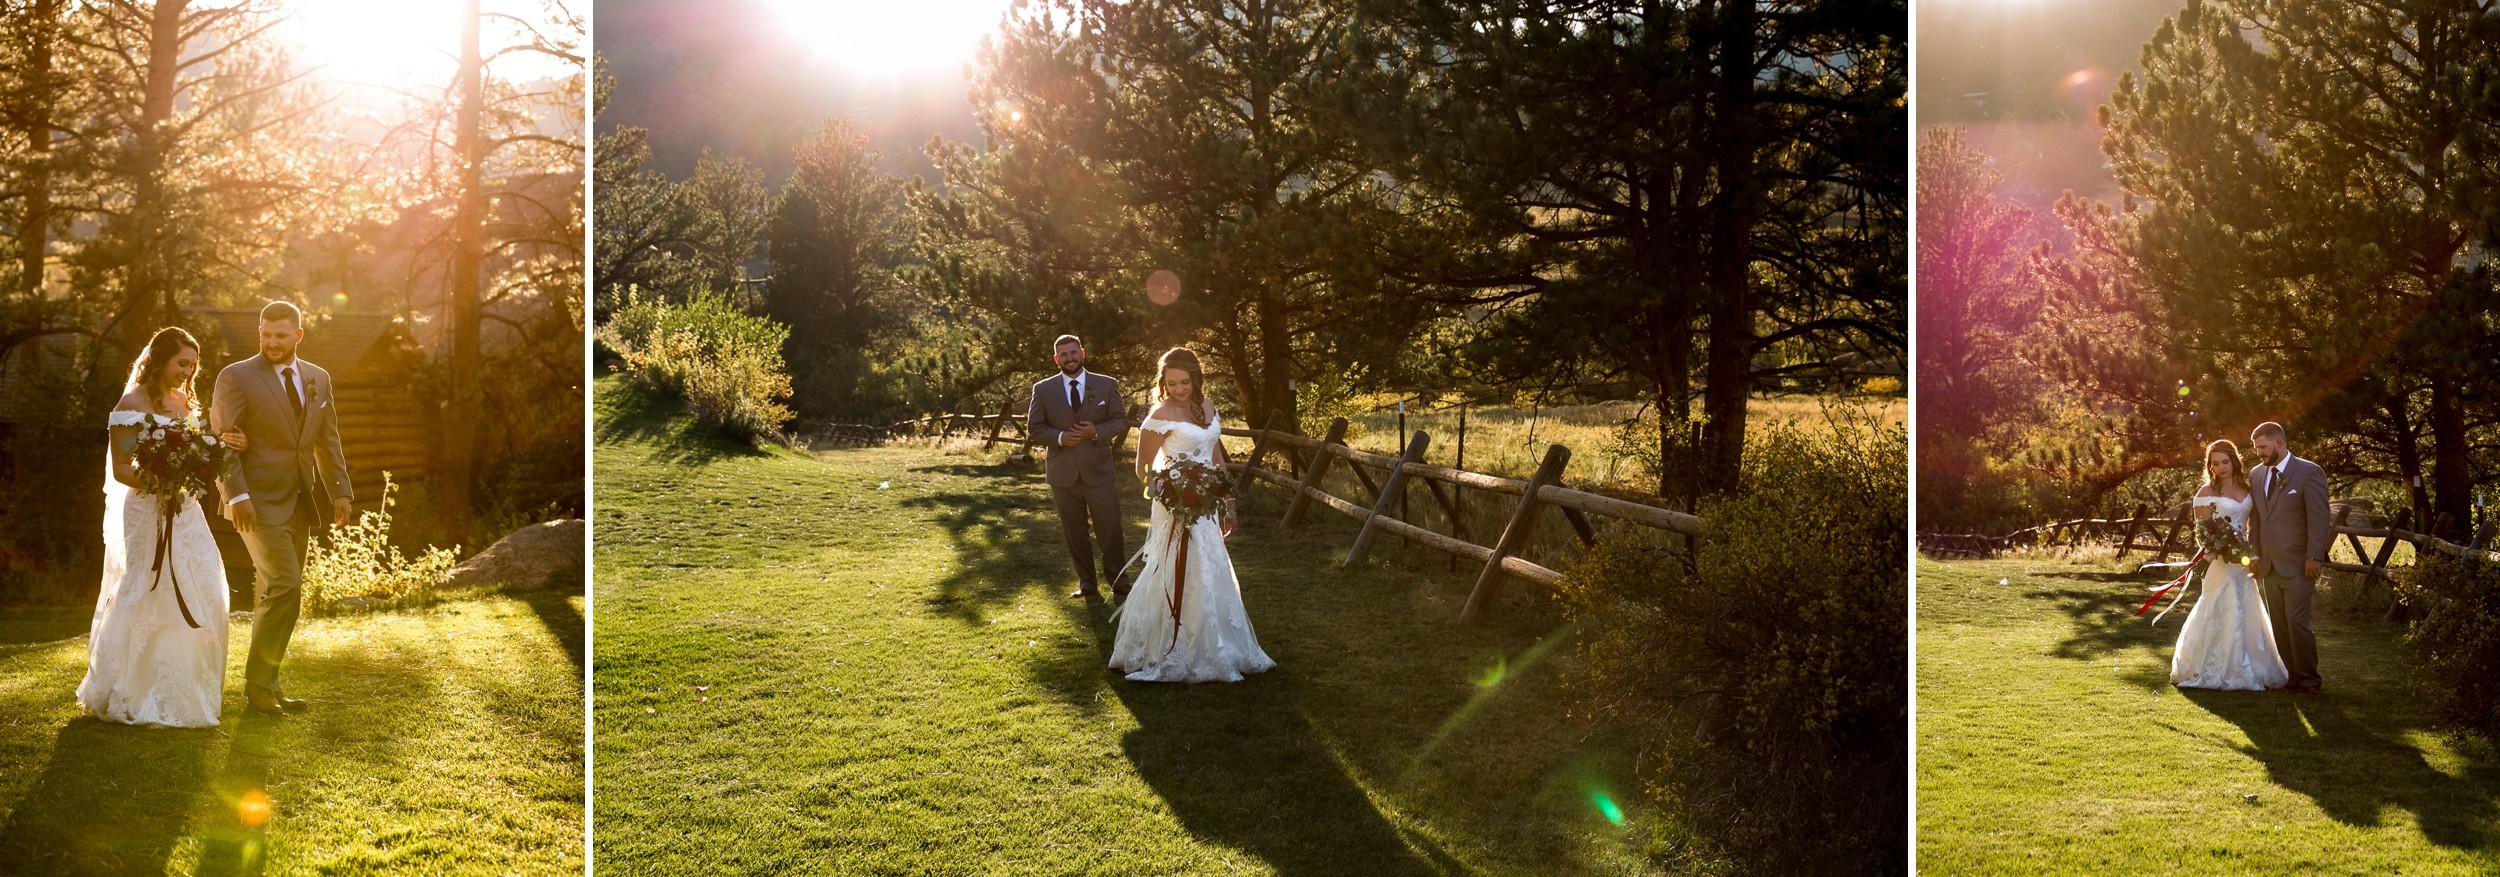 Black_Canyon_Inn_Twin_Owls_Steakhouse_Estes_Park_Wedding_Photographer 14.jpg